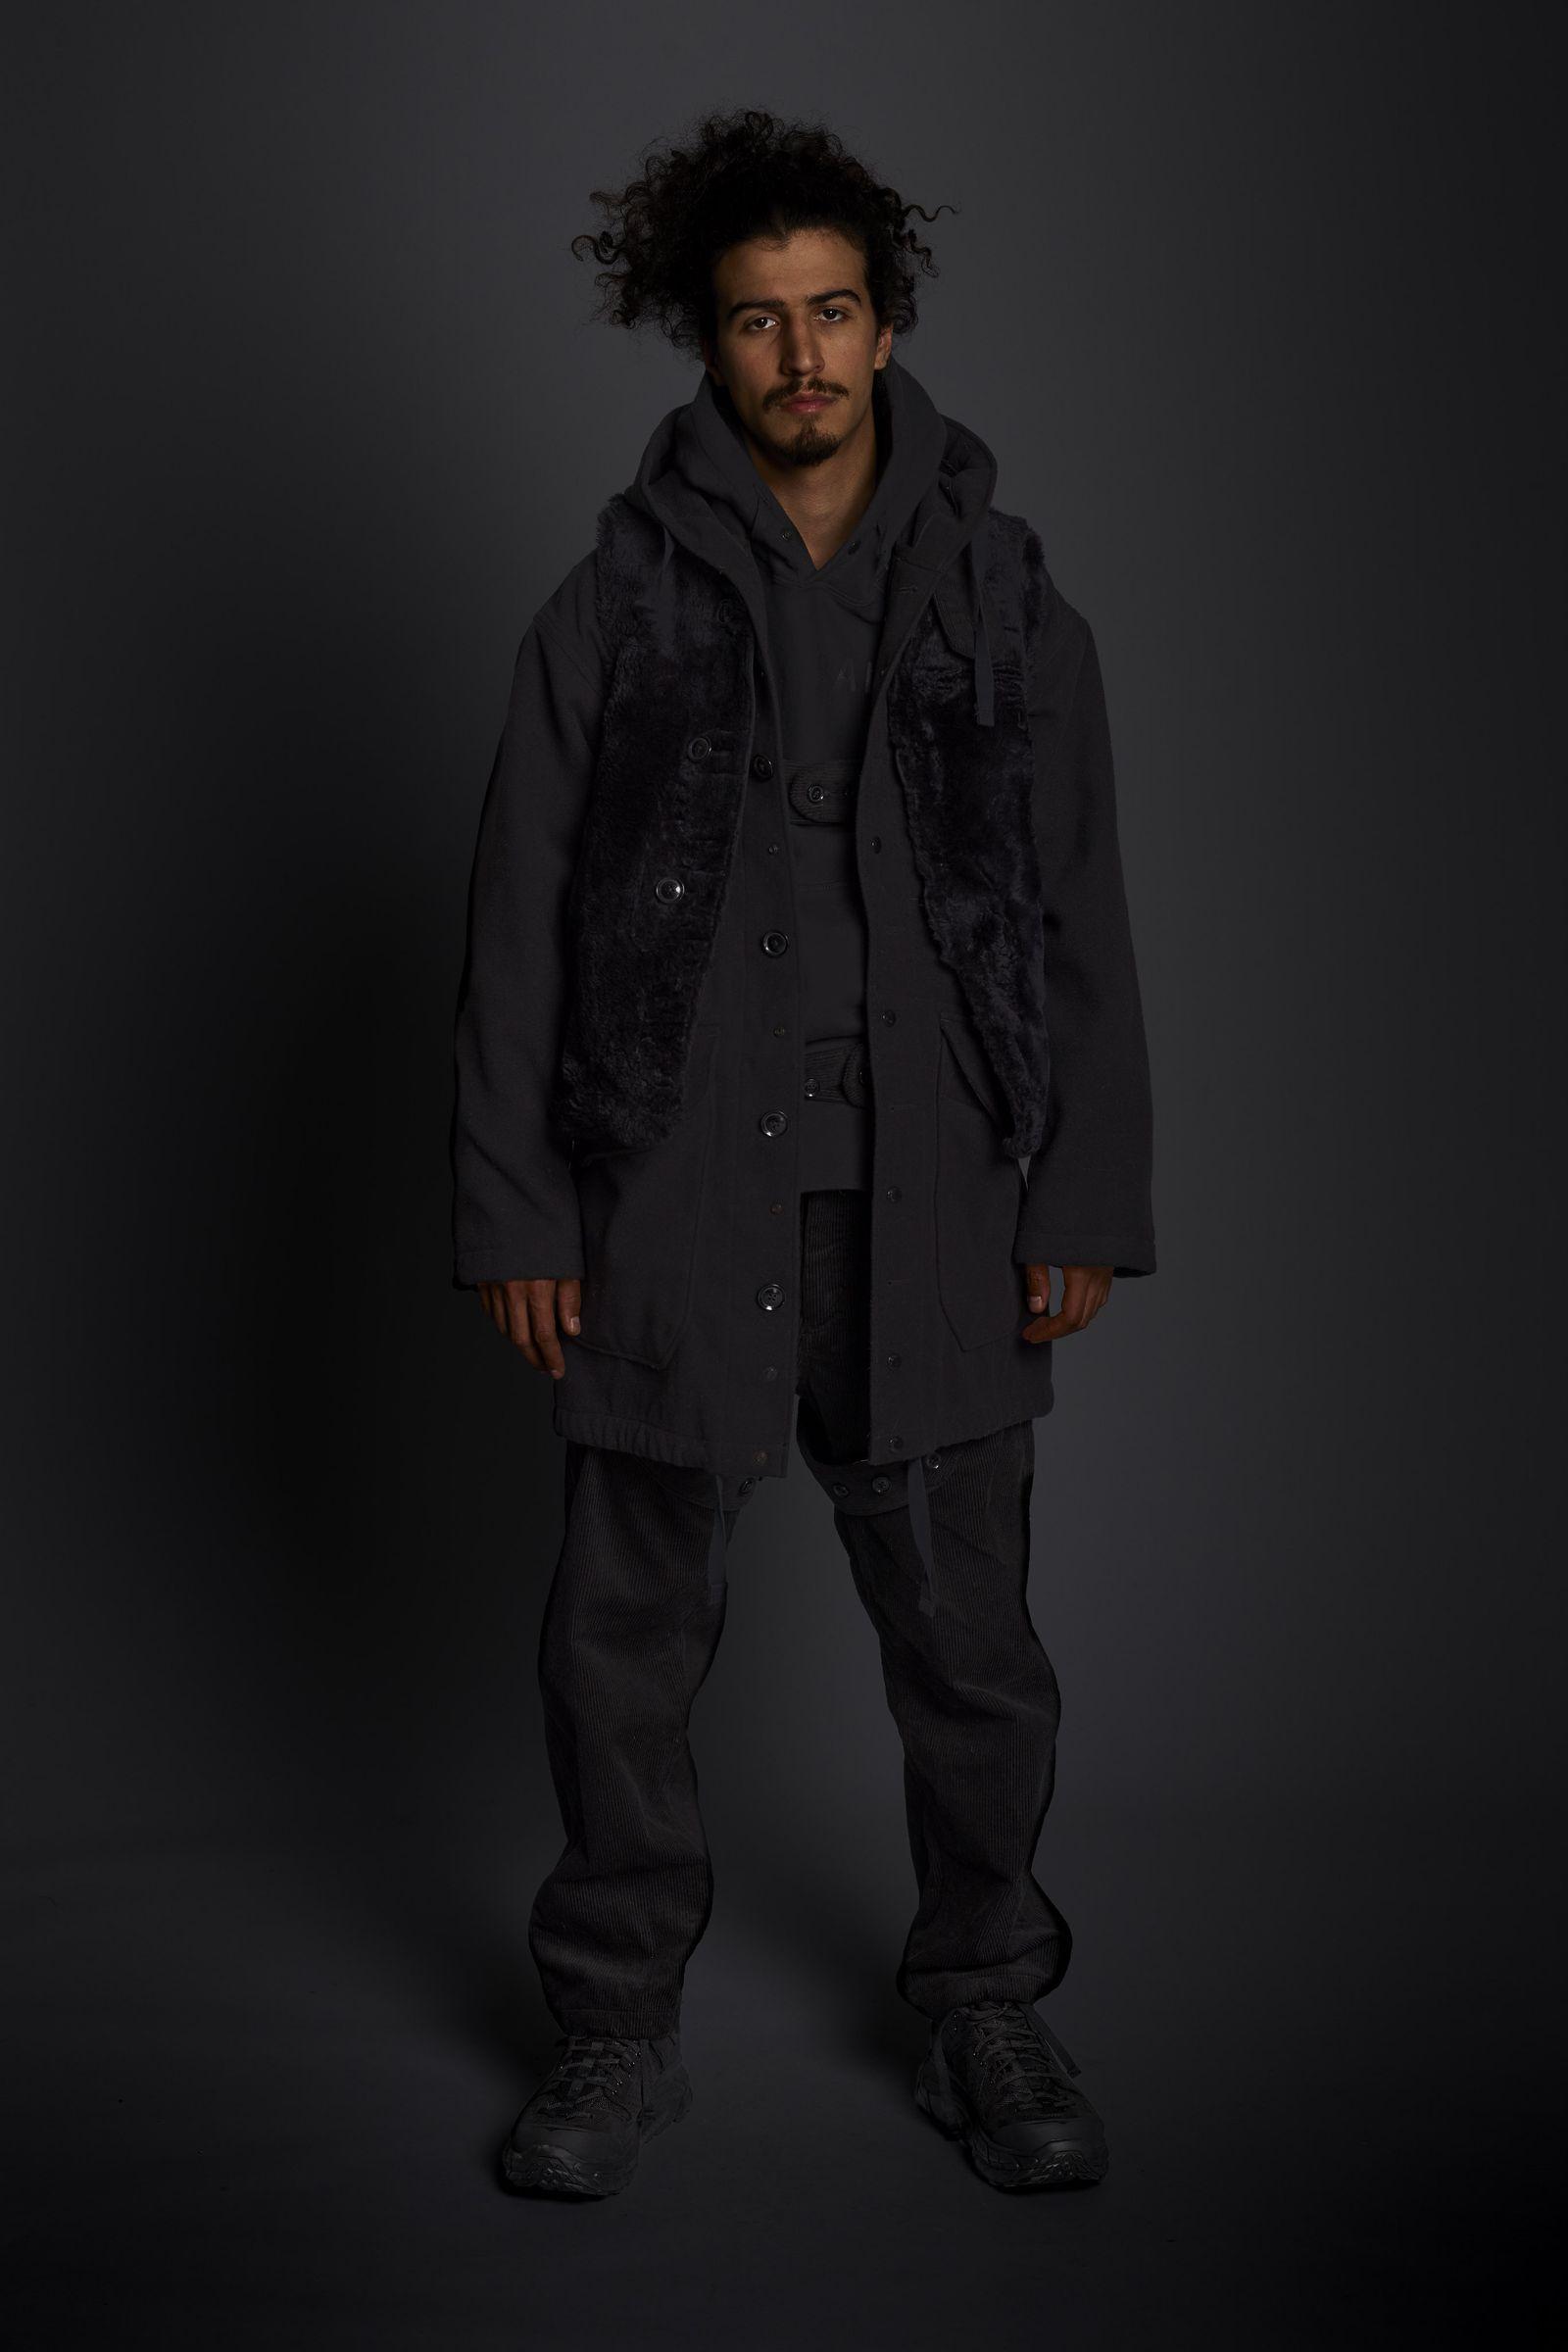 engineered-garments-fall-winter-2020-36